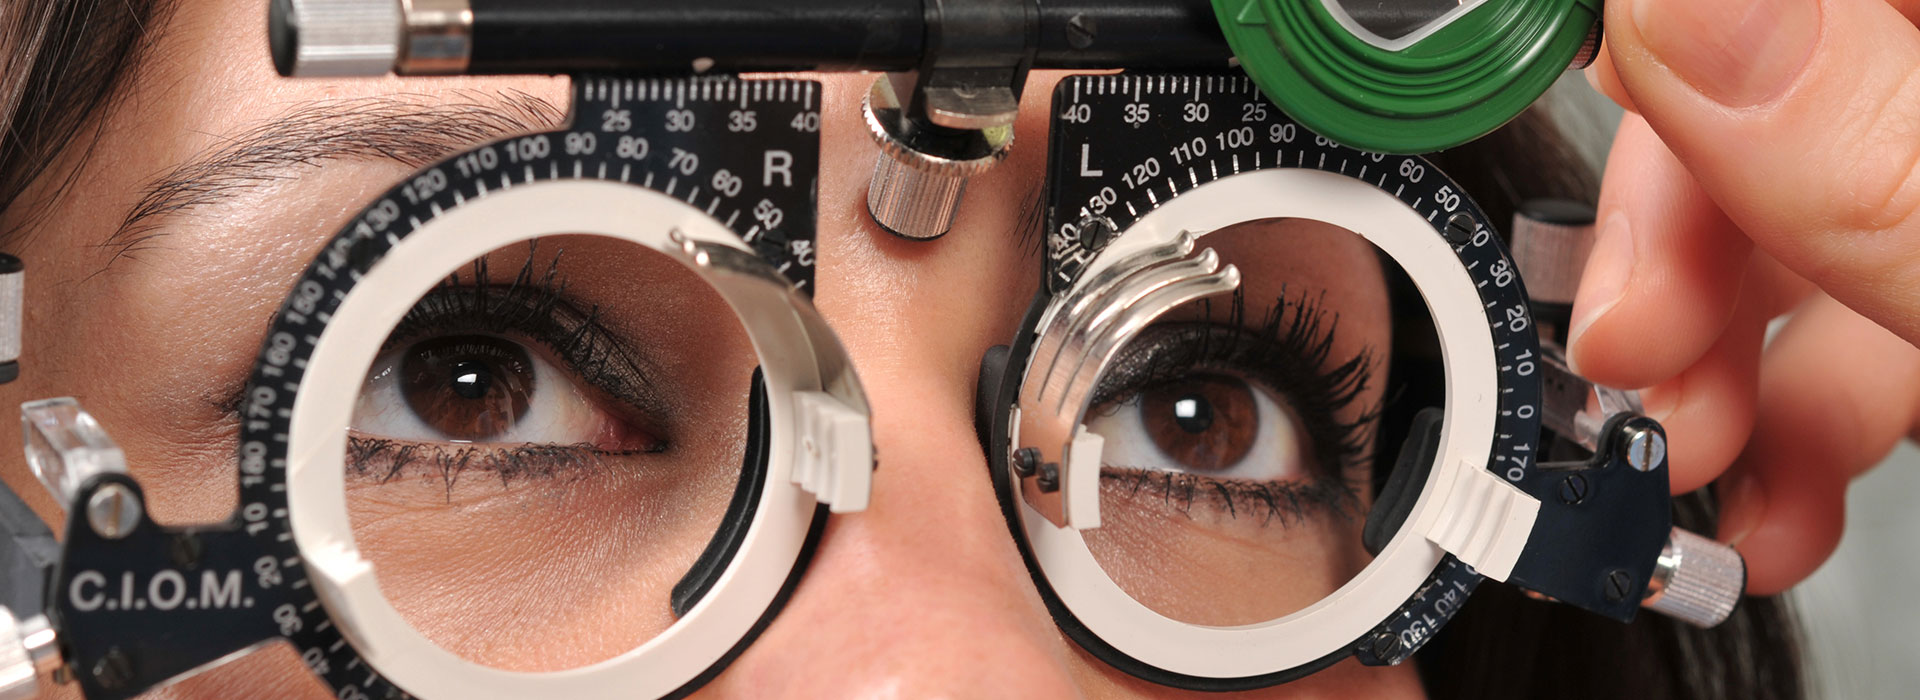 Importance of Regular Eye Check-Ups